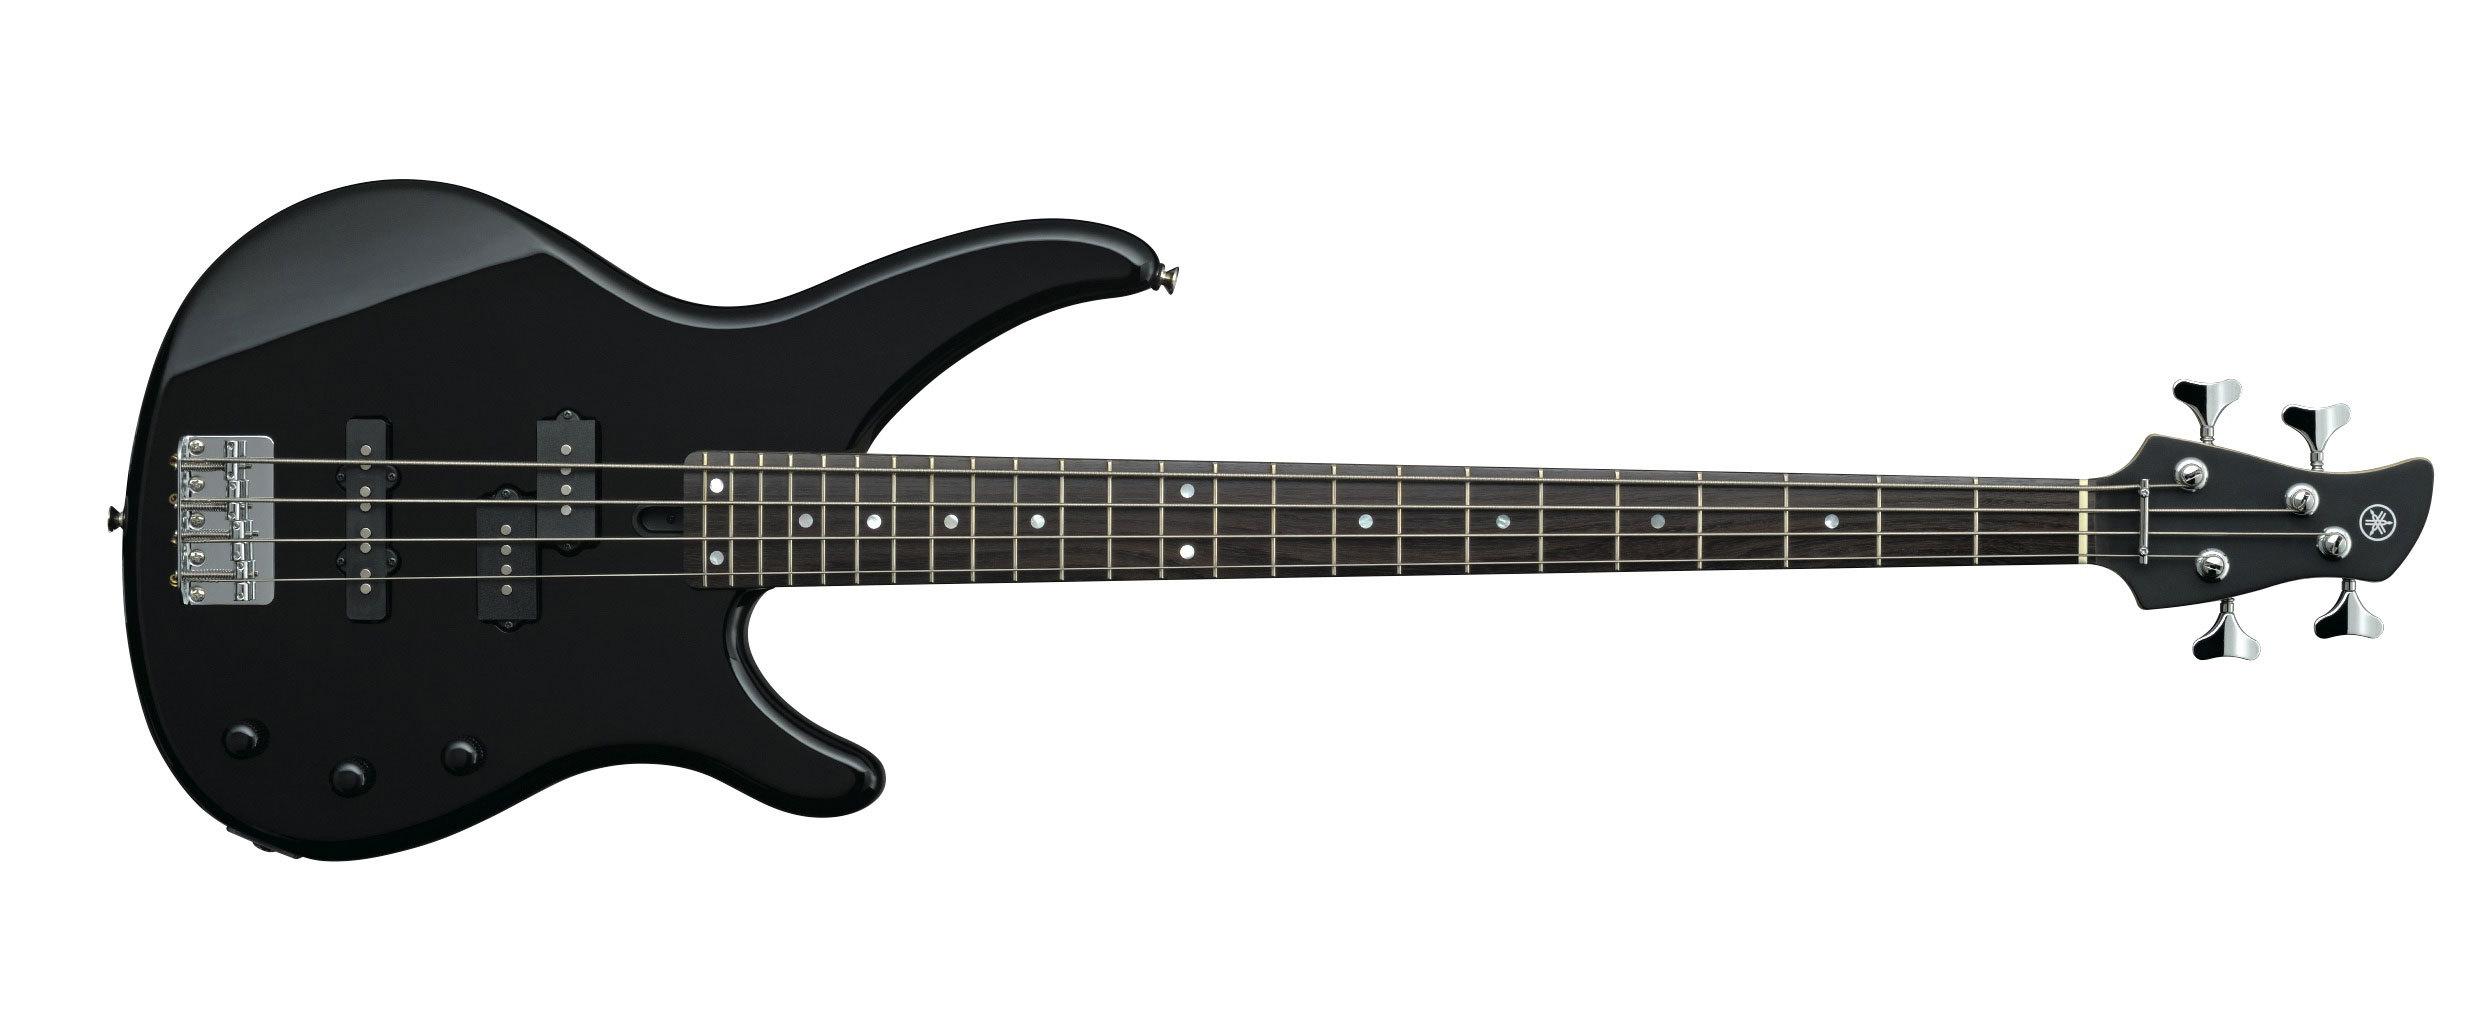 546ccb04b0a Yamaha 4 String Bass - Black - Long & McQuade Musical Instruments